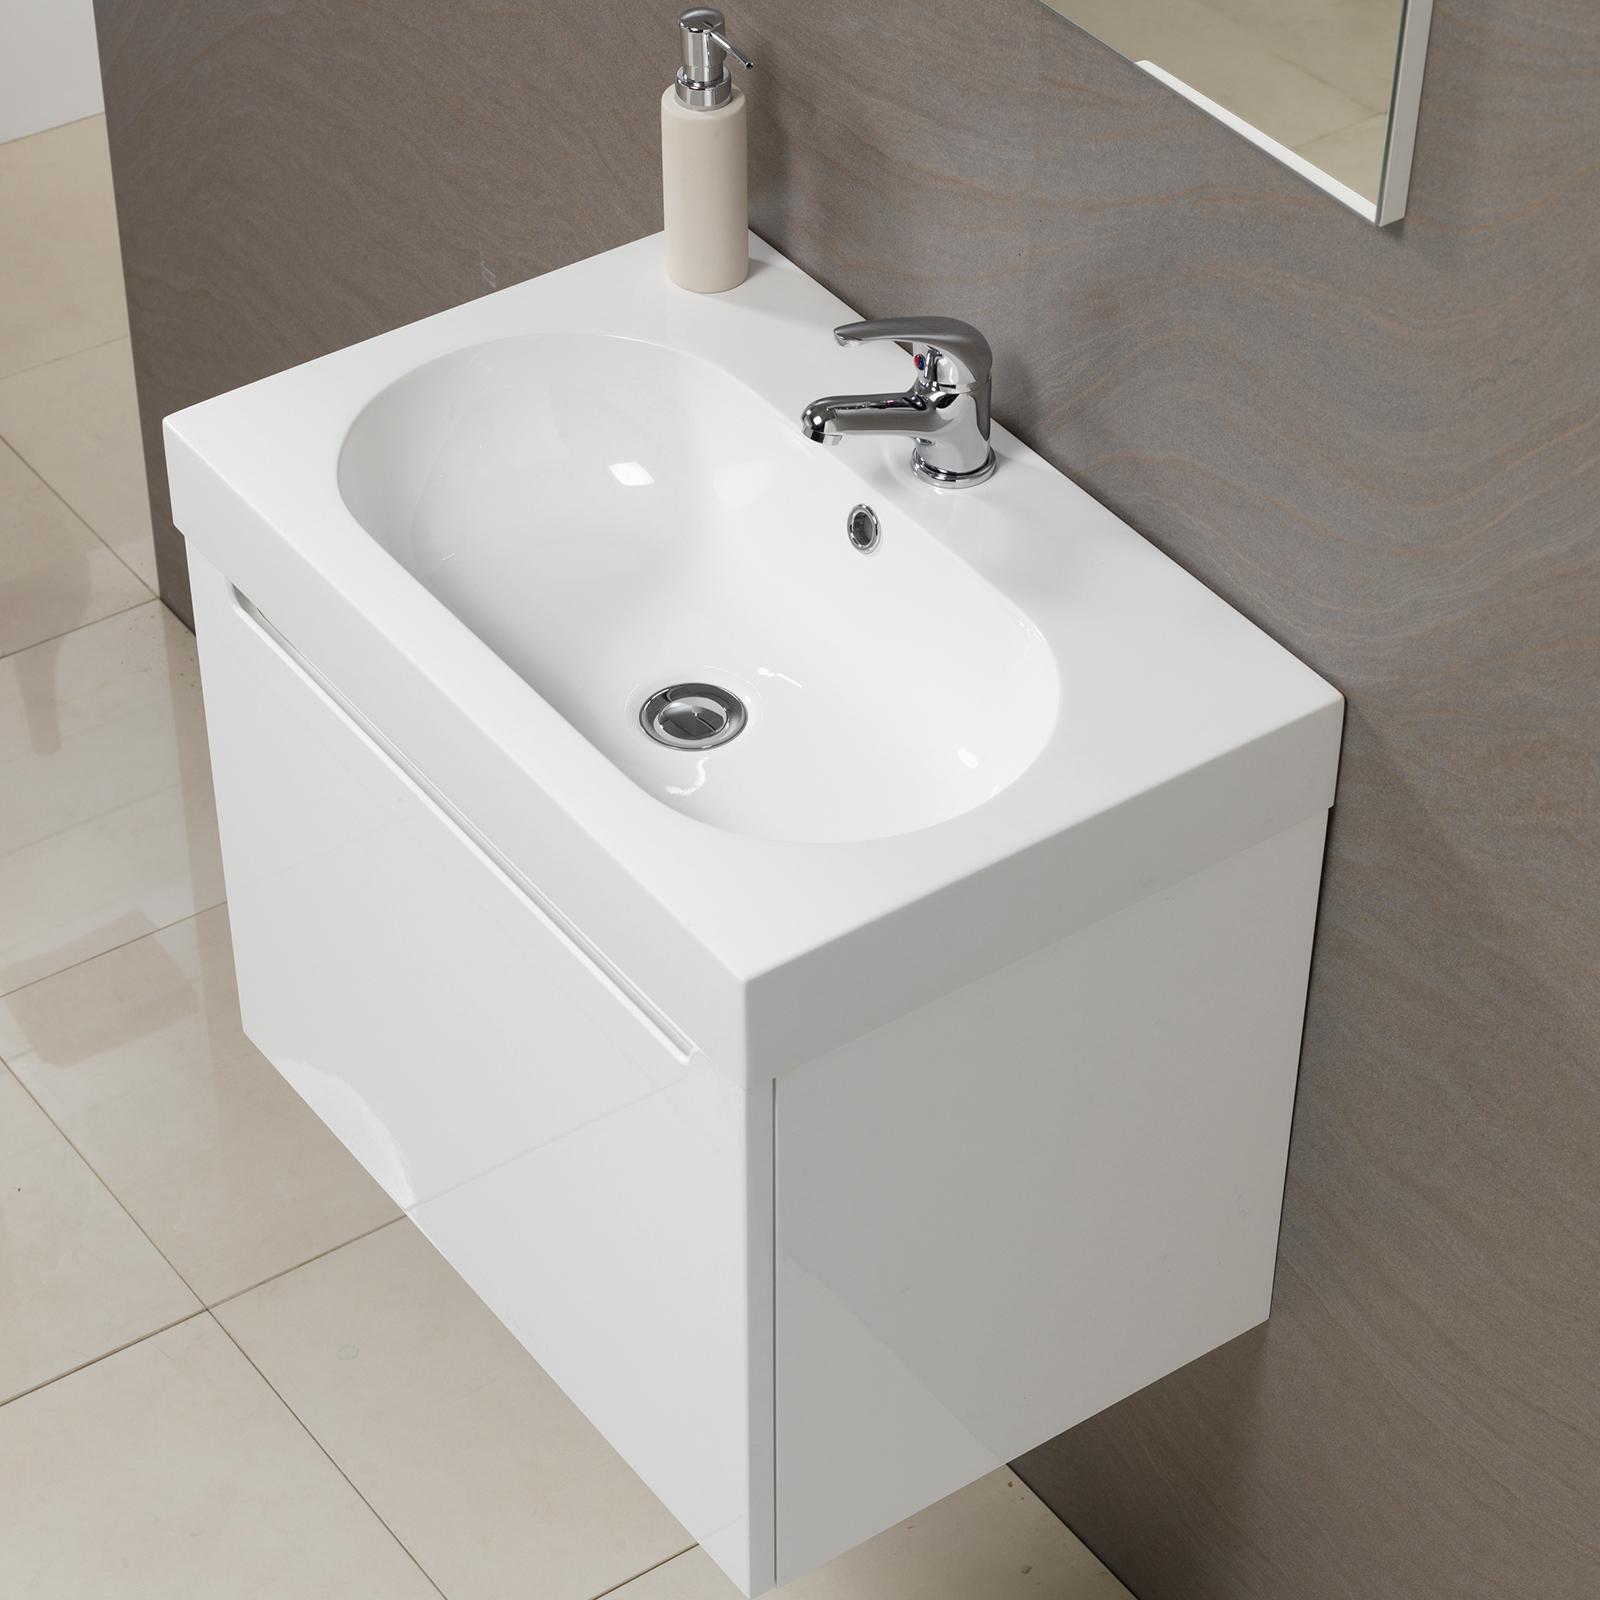 Radius 60 Wall Hung Vanity Unit Amp Basin With Tap Vanity Units With Tap Allbits Co Uk